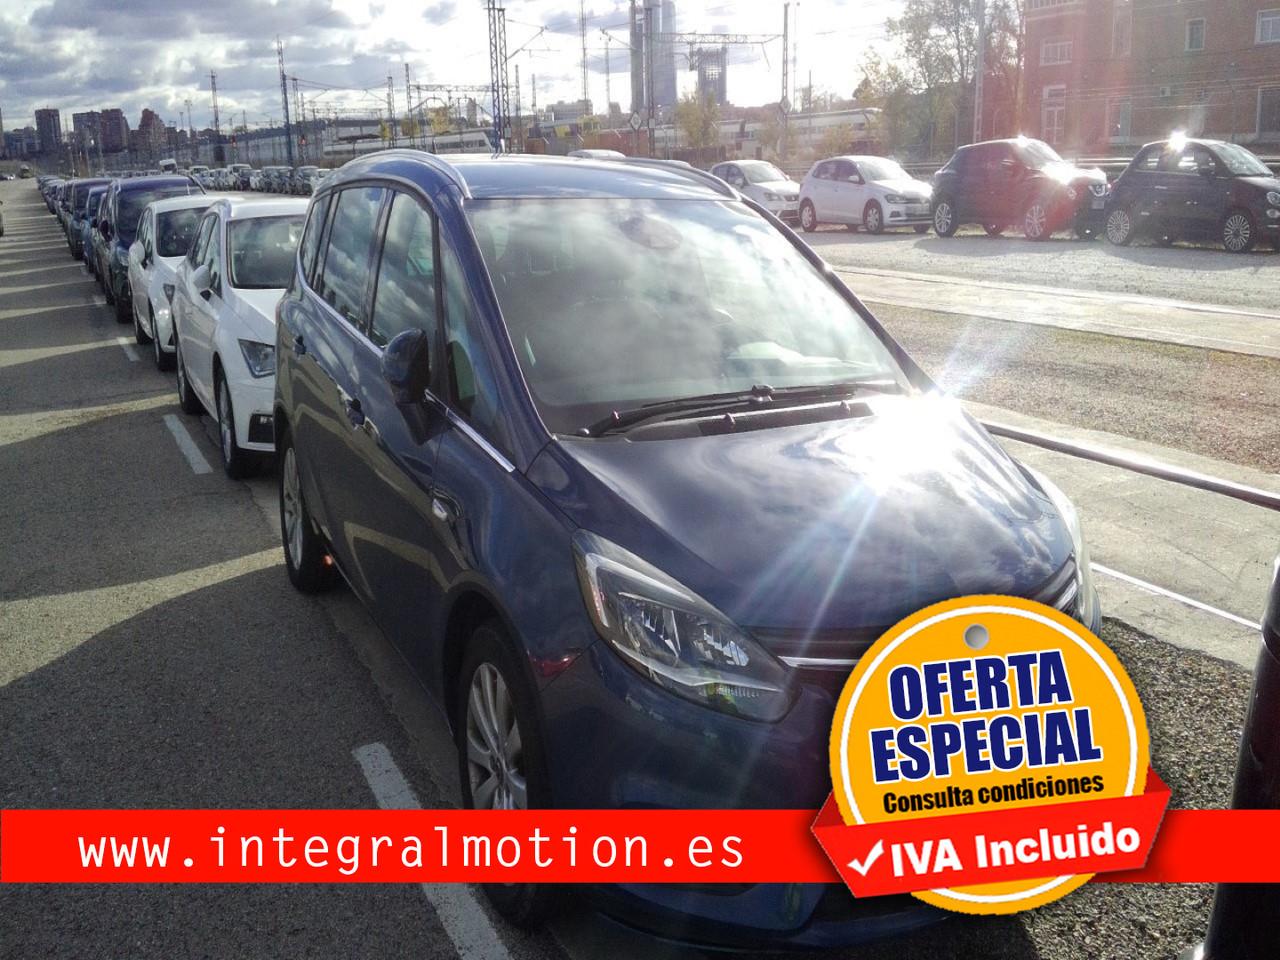 Opel Zafira 1.6 CDTi S/S 99kW (134CV) Excellence 17  - Foto 1